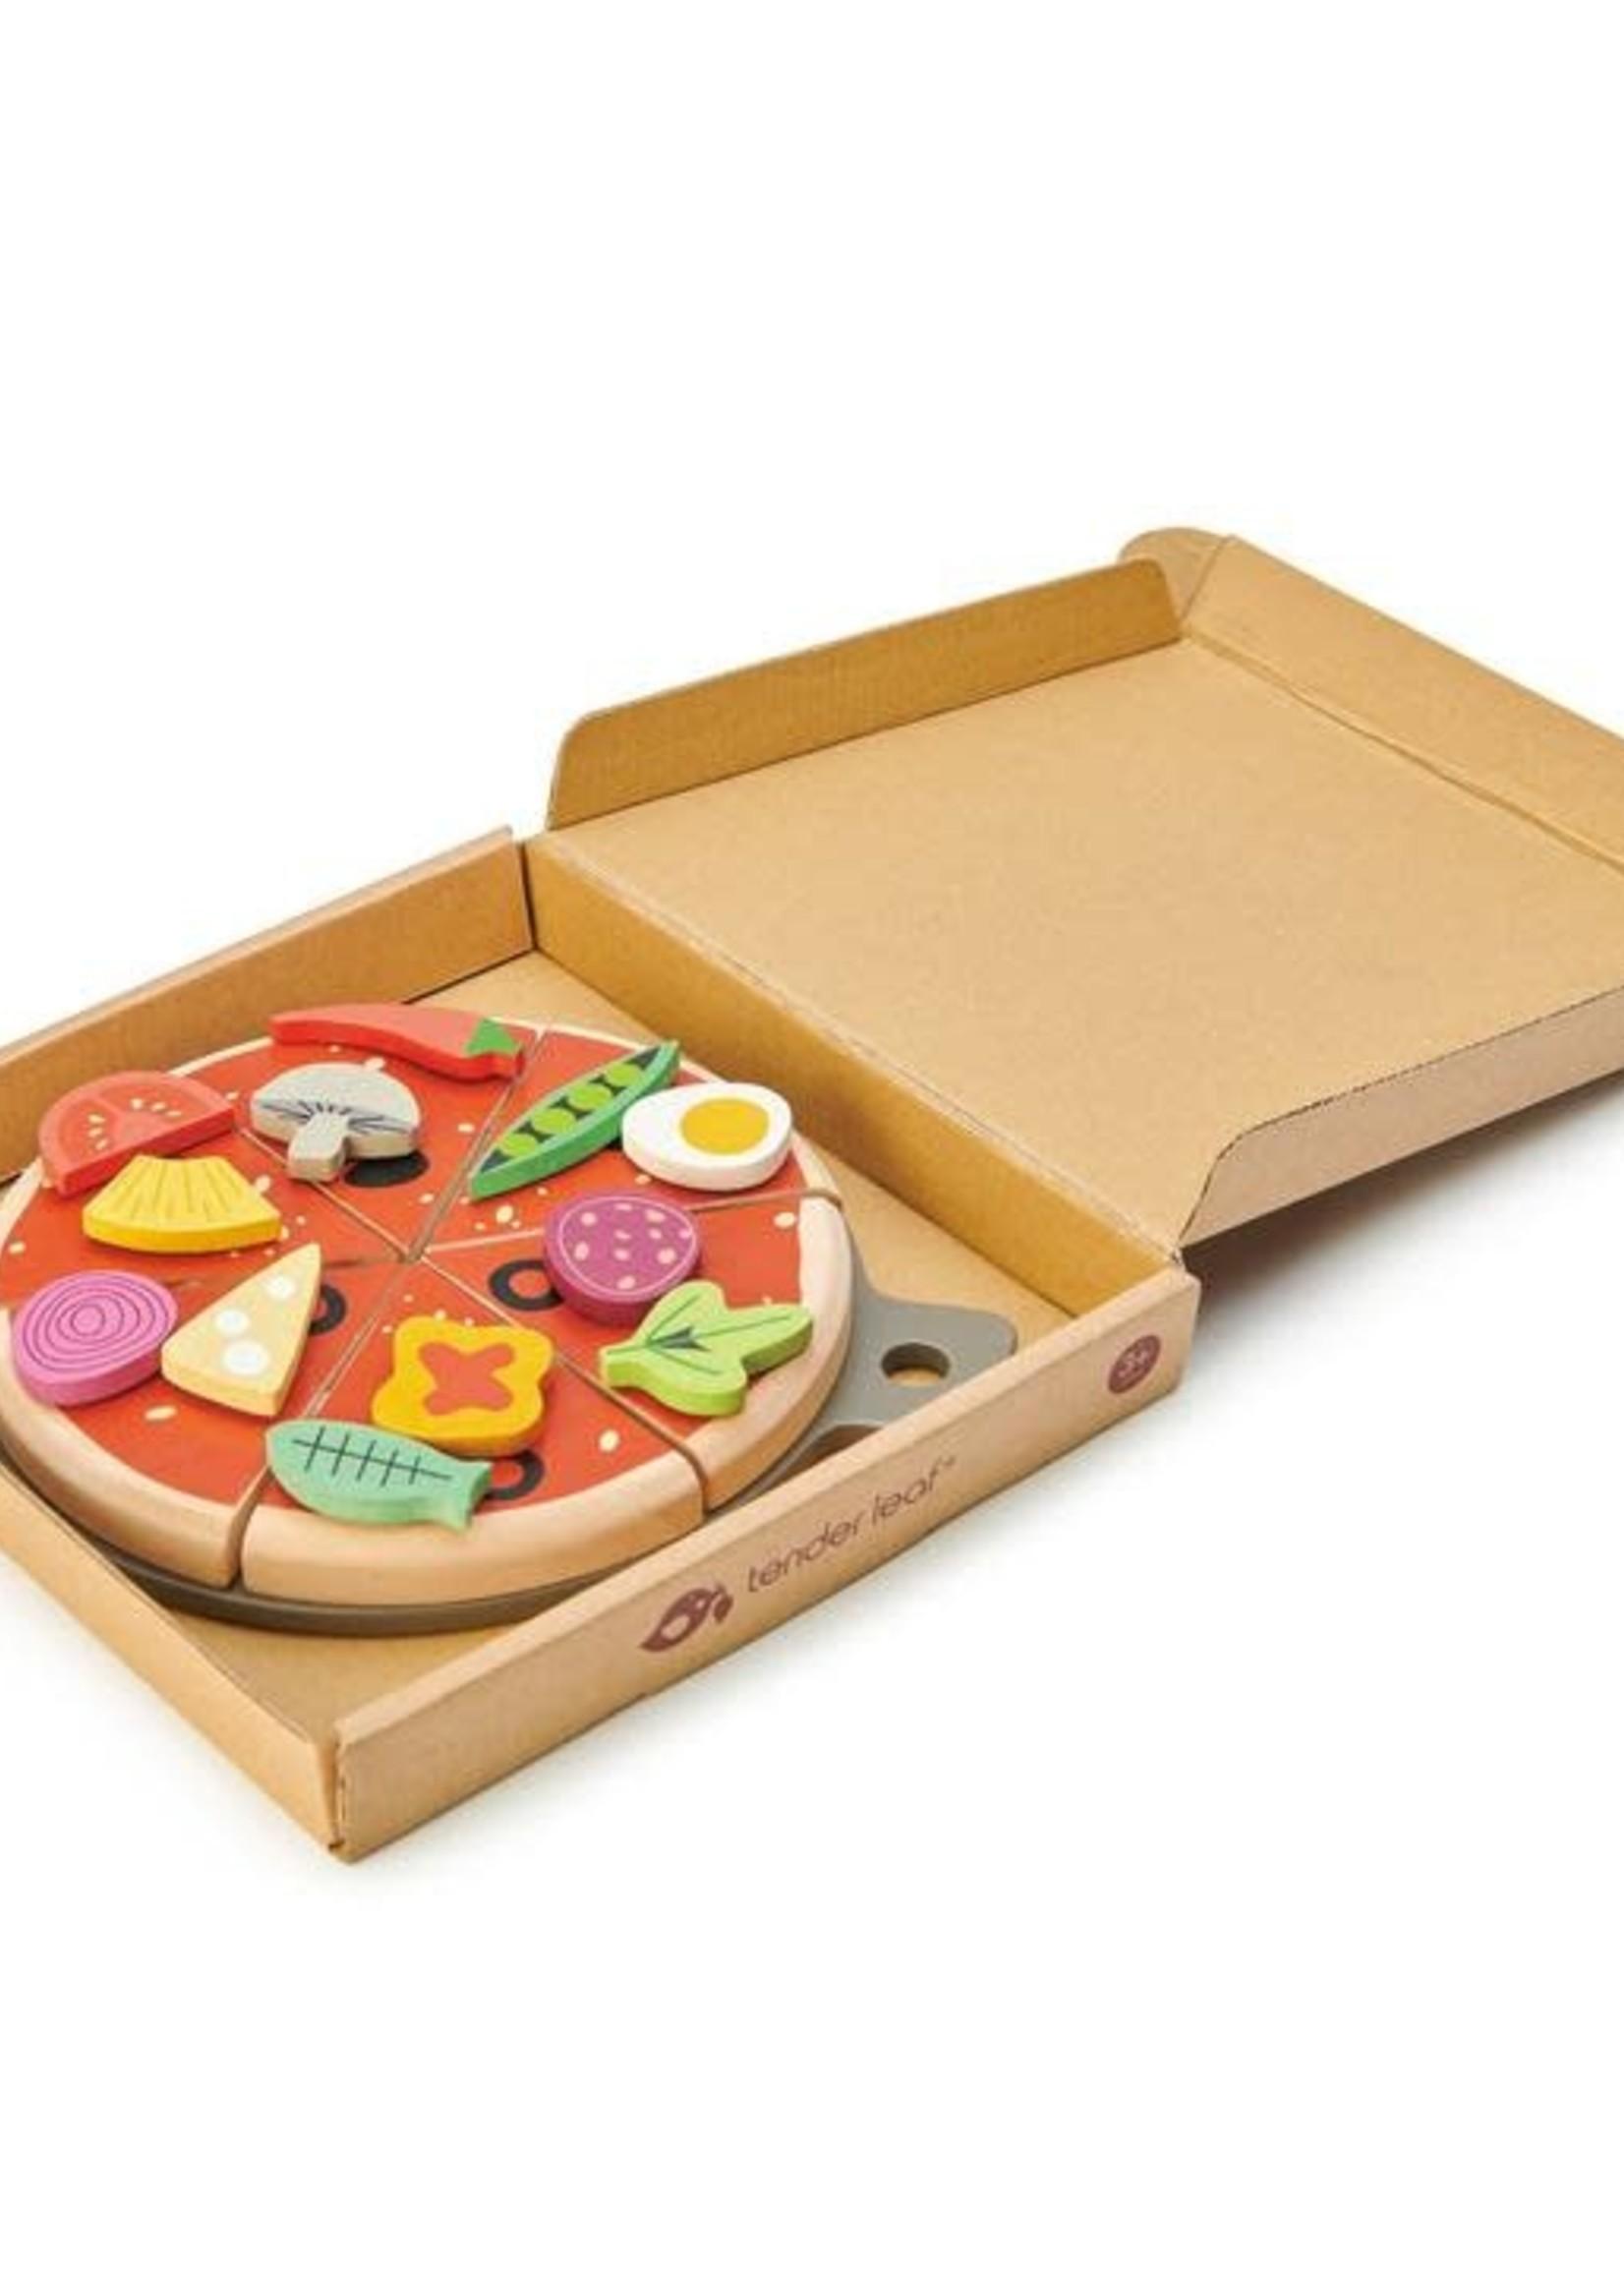 Tender Leaf Toy Tender Leaf Pizza Party